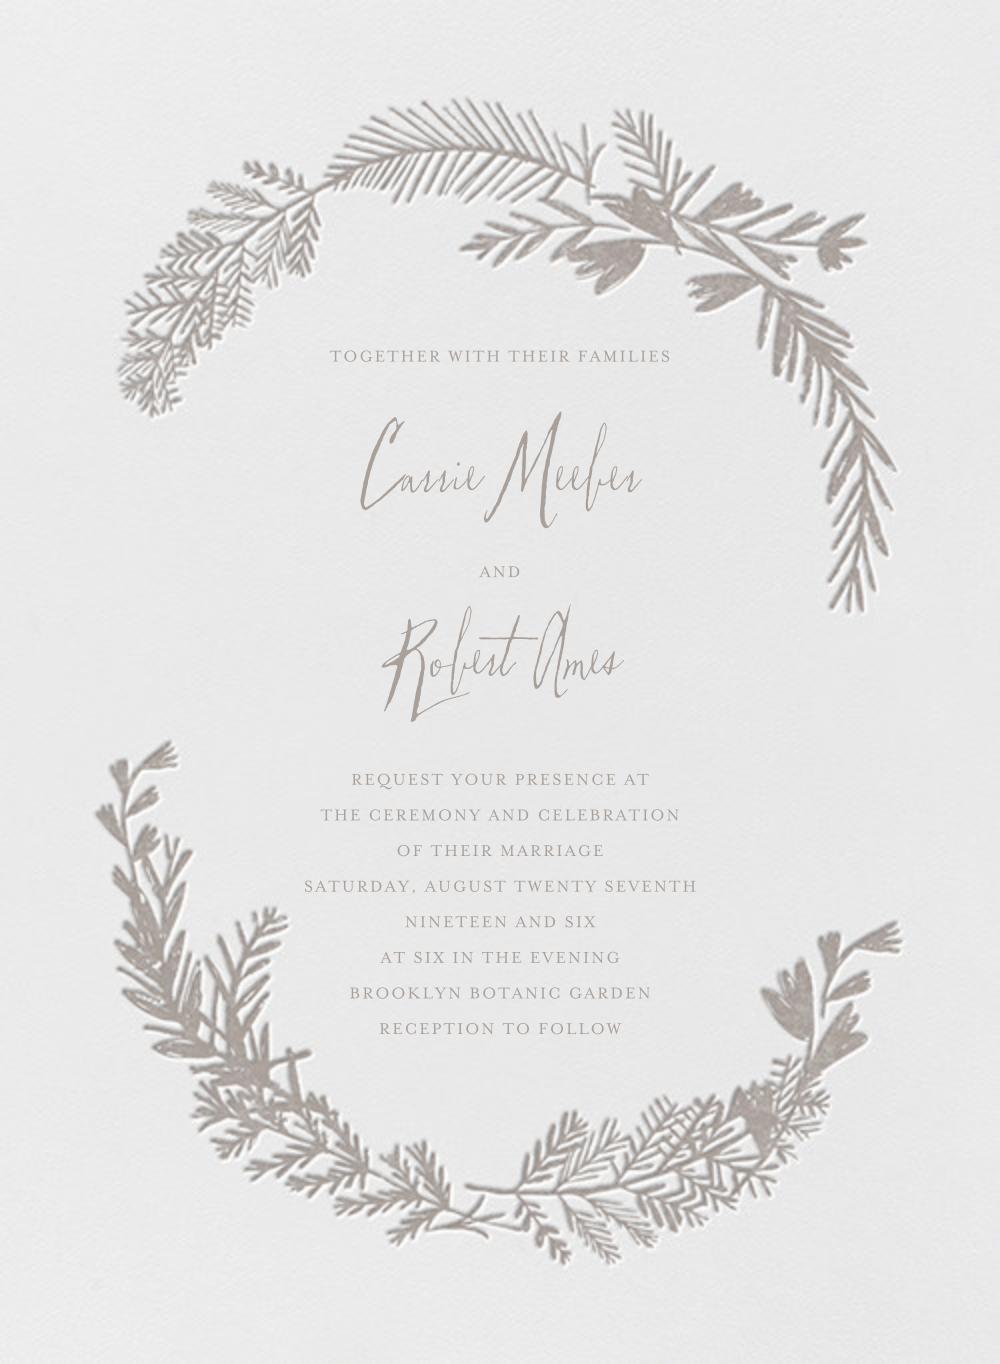 Miss Mimi Margeaux I (Invitation) - Taupe - Mr. Boddington's Studio - All